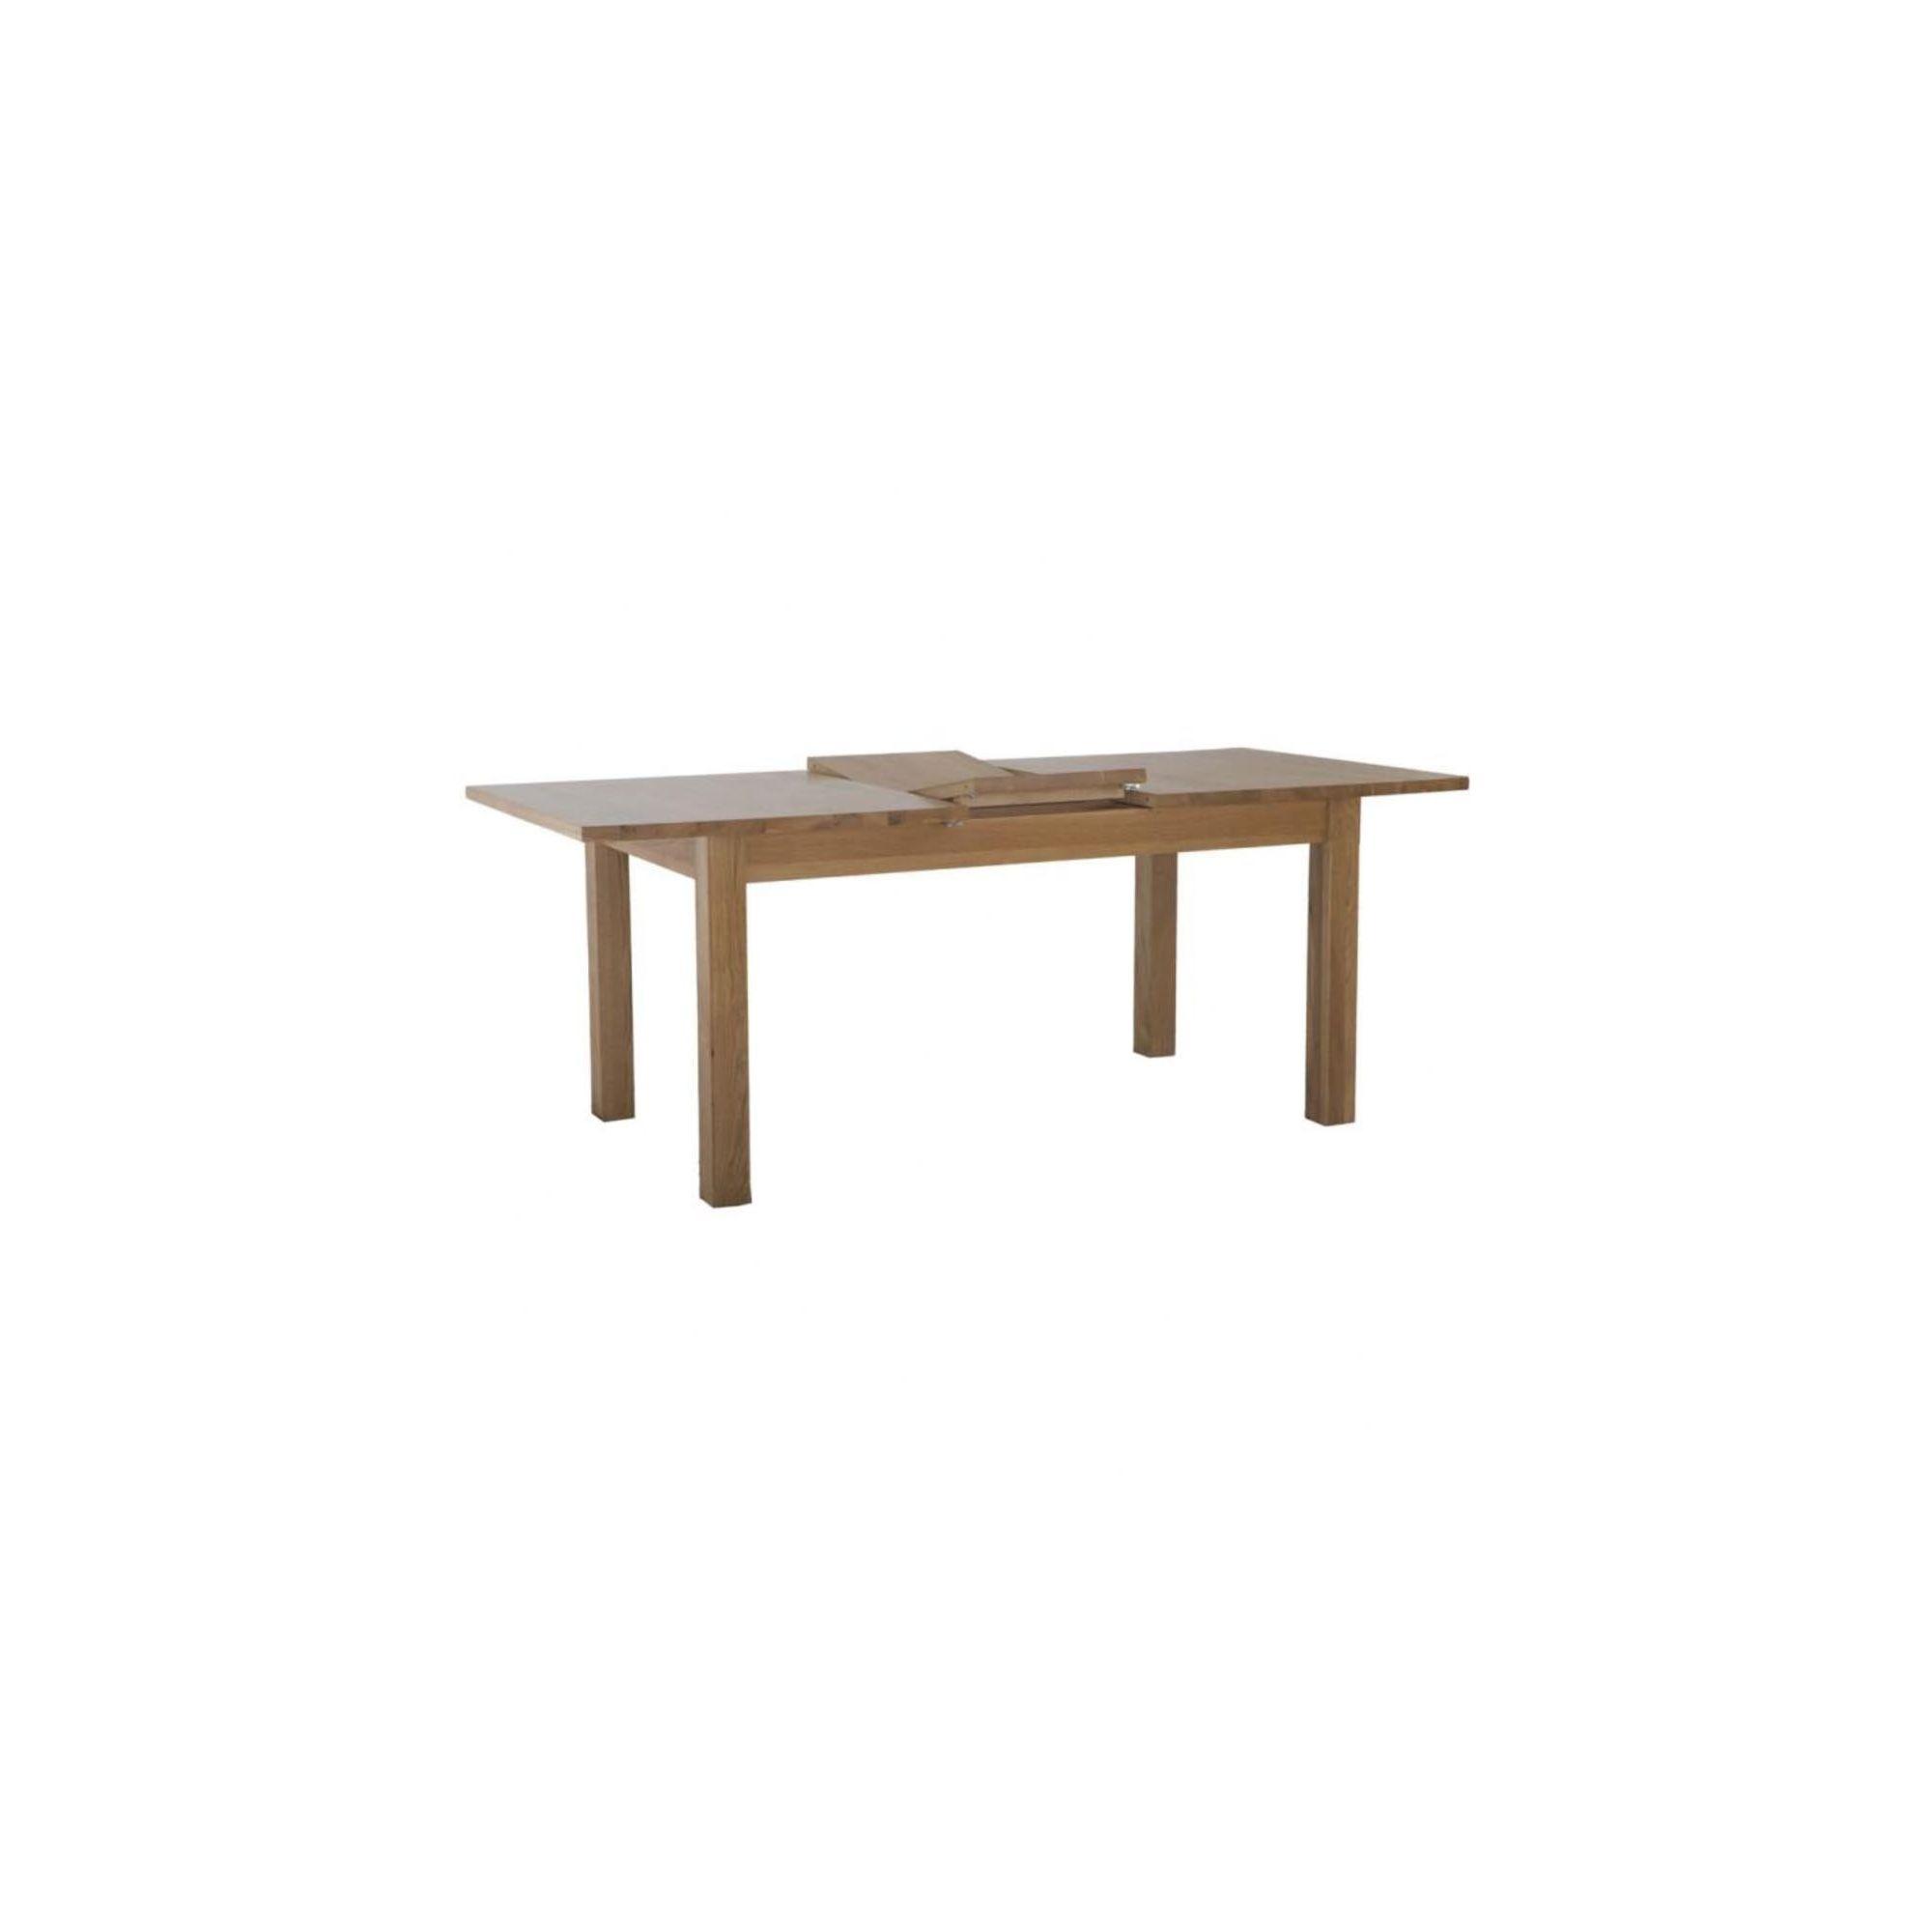 Oakinsen Balmain 160cm-200cm Extending Dining Table